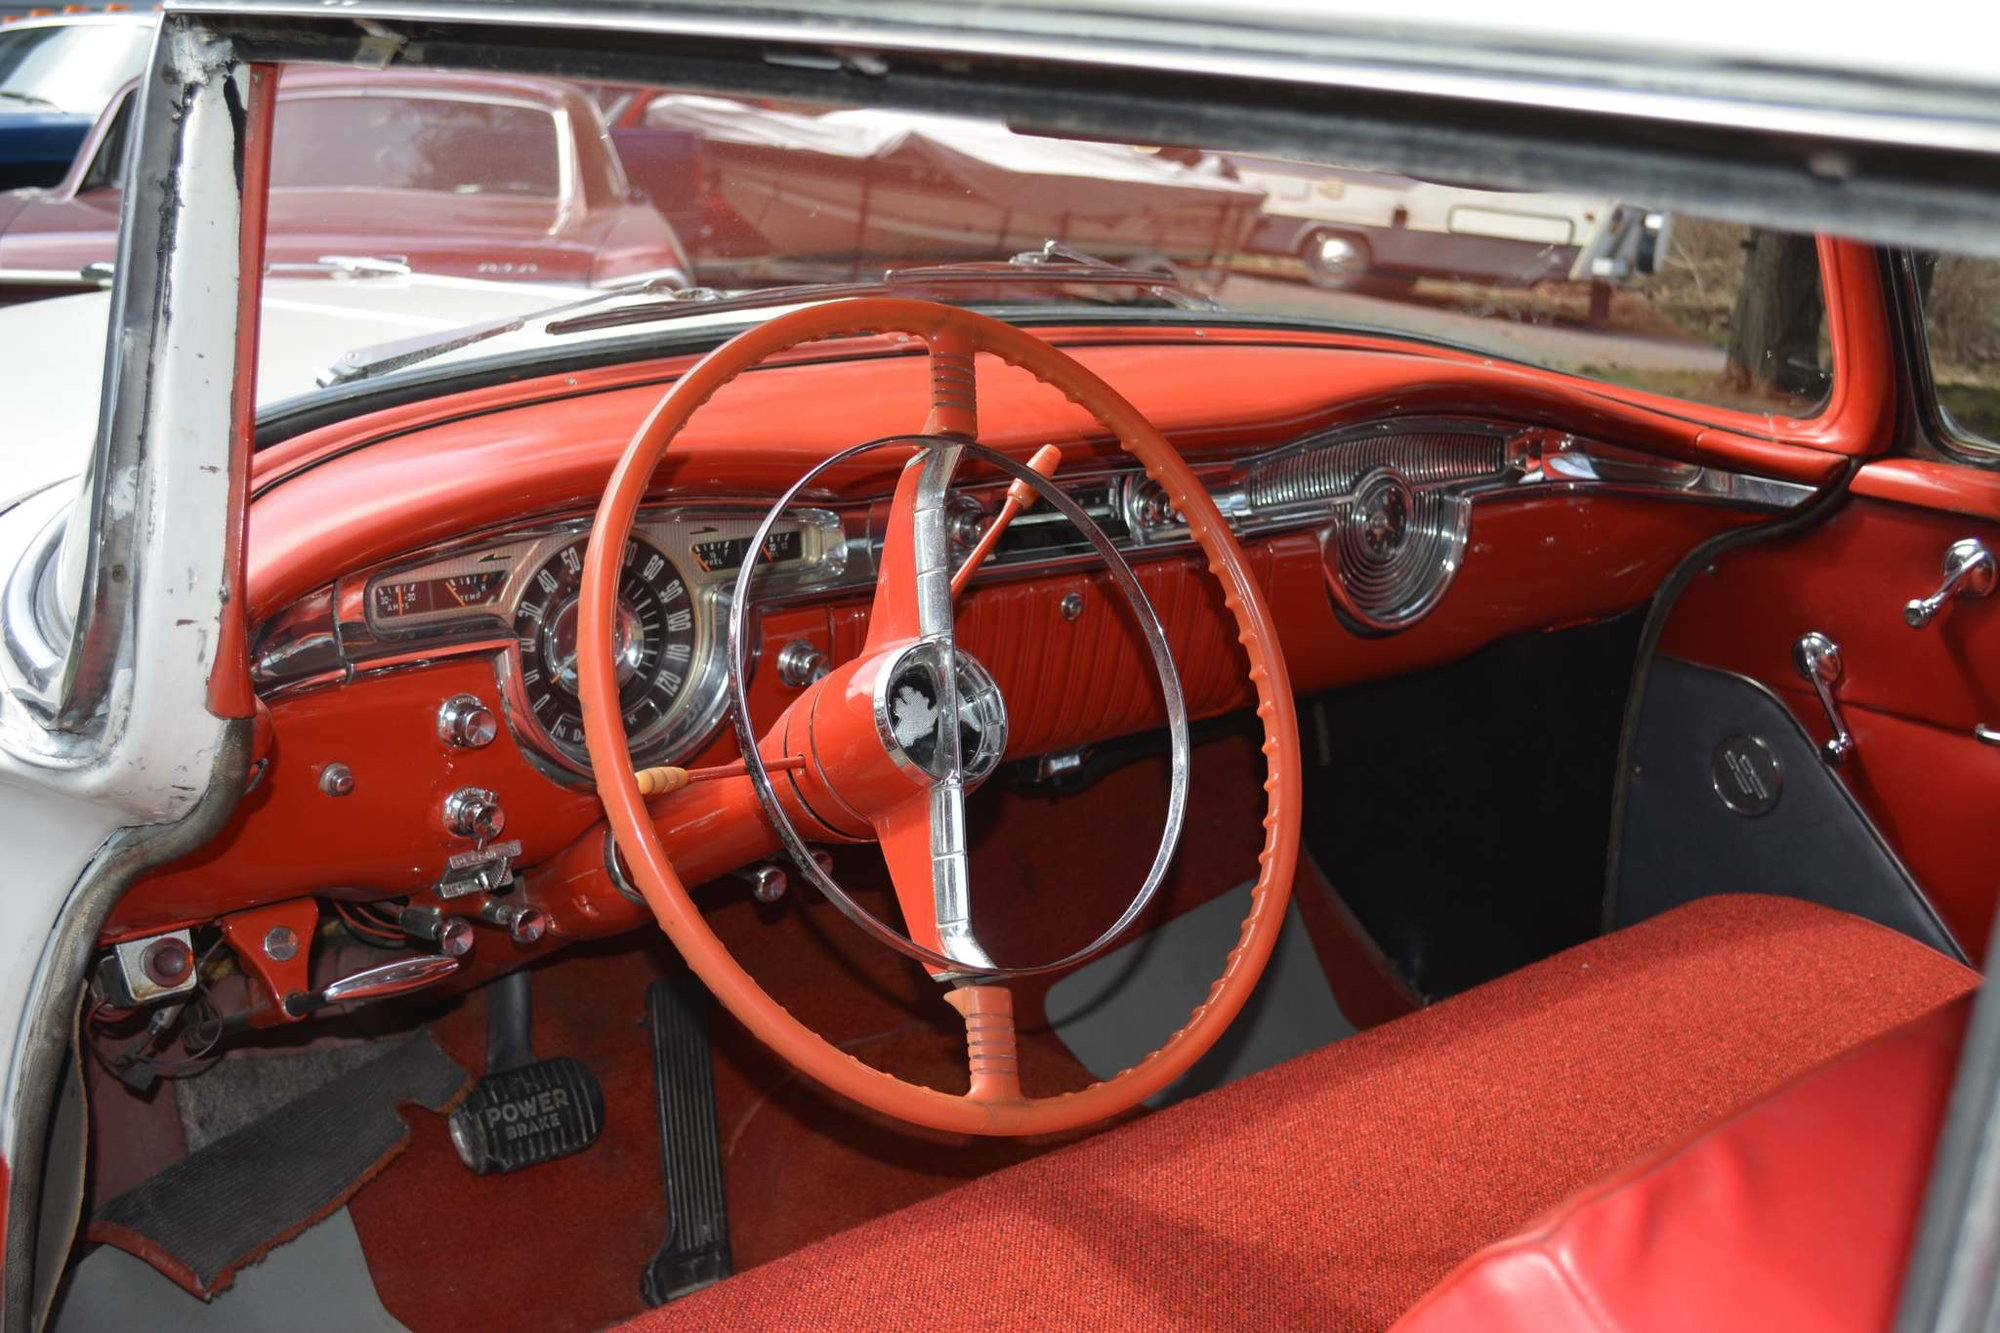 1955 Oldsmobile Rocket 88 - Complete Car - ClassicOldsmobile com